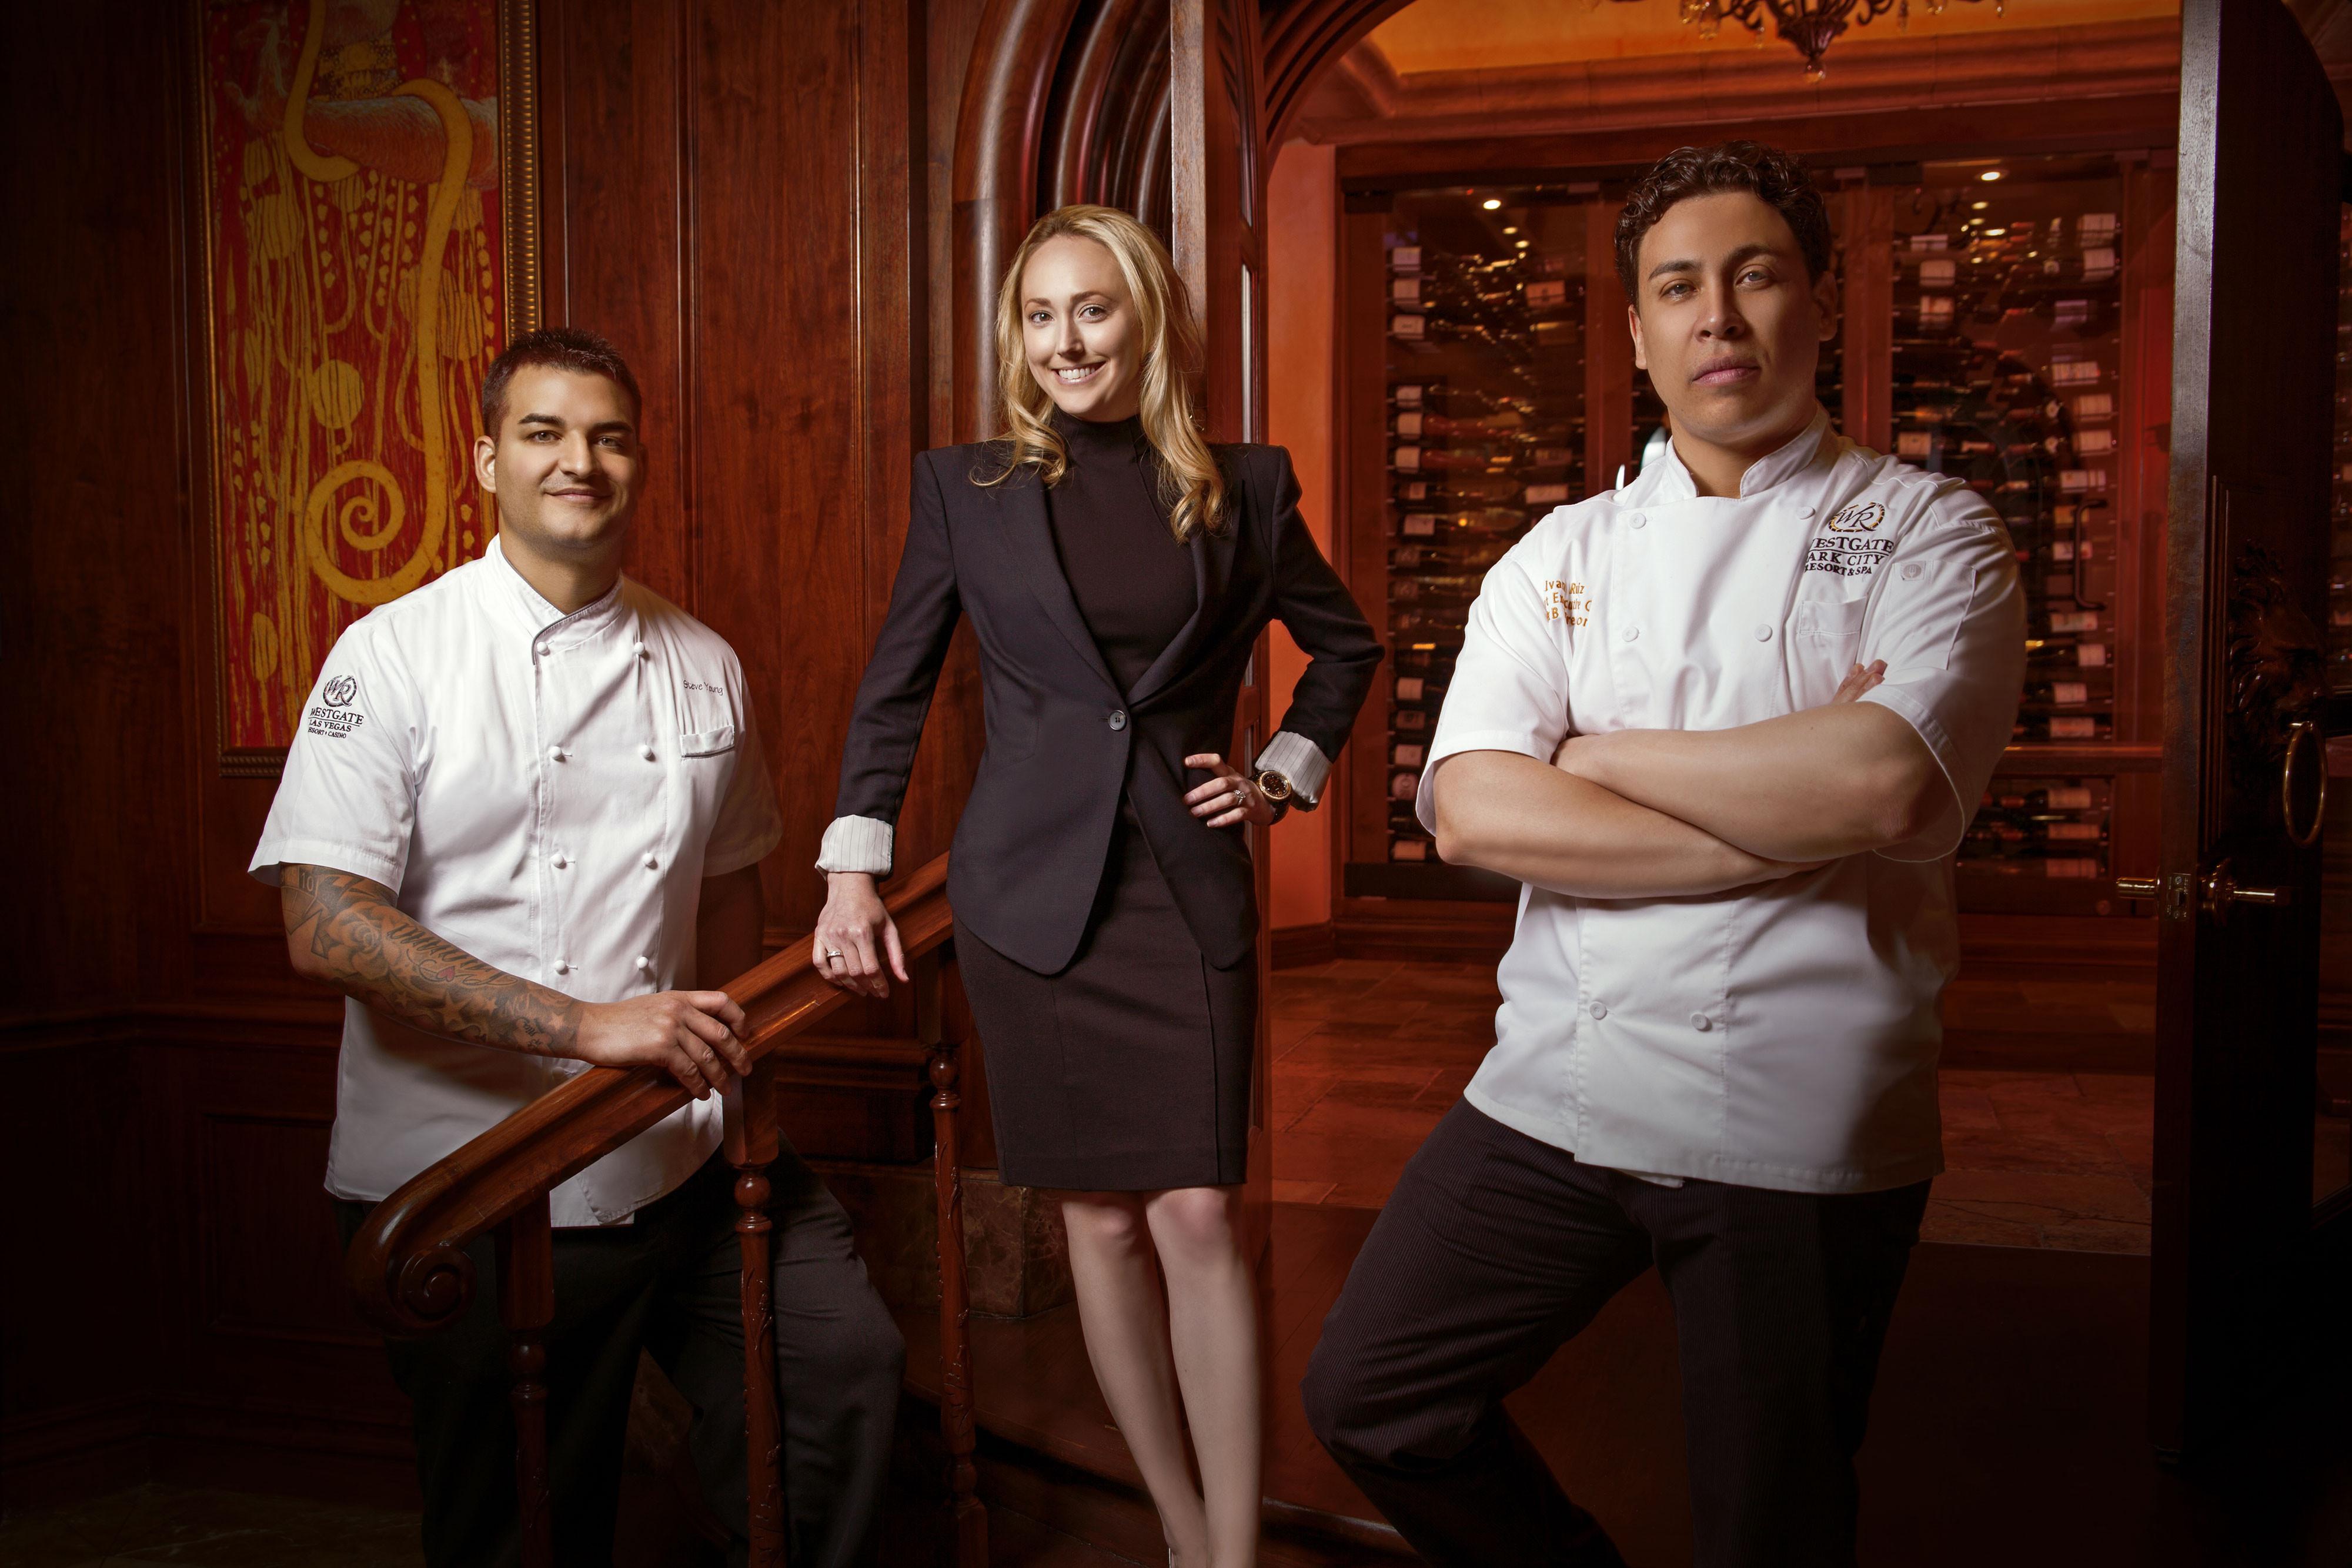 Edge Steakhouse Achieves Top Rankings on TripAdvisor in Park City, Utah & Las Vegas, Nevada